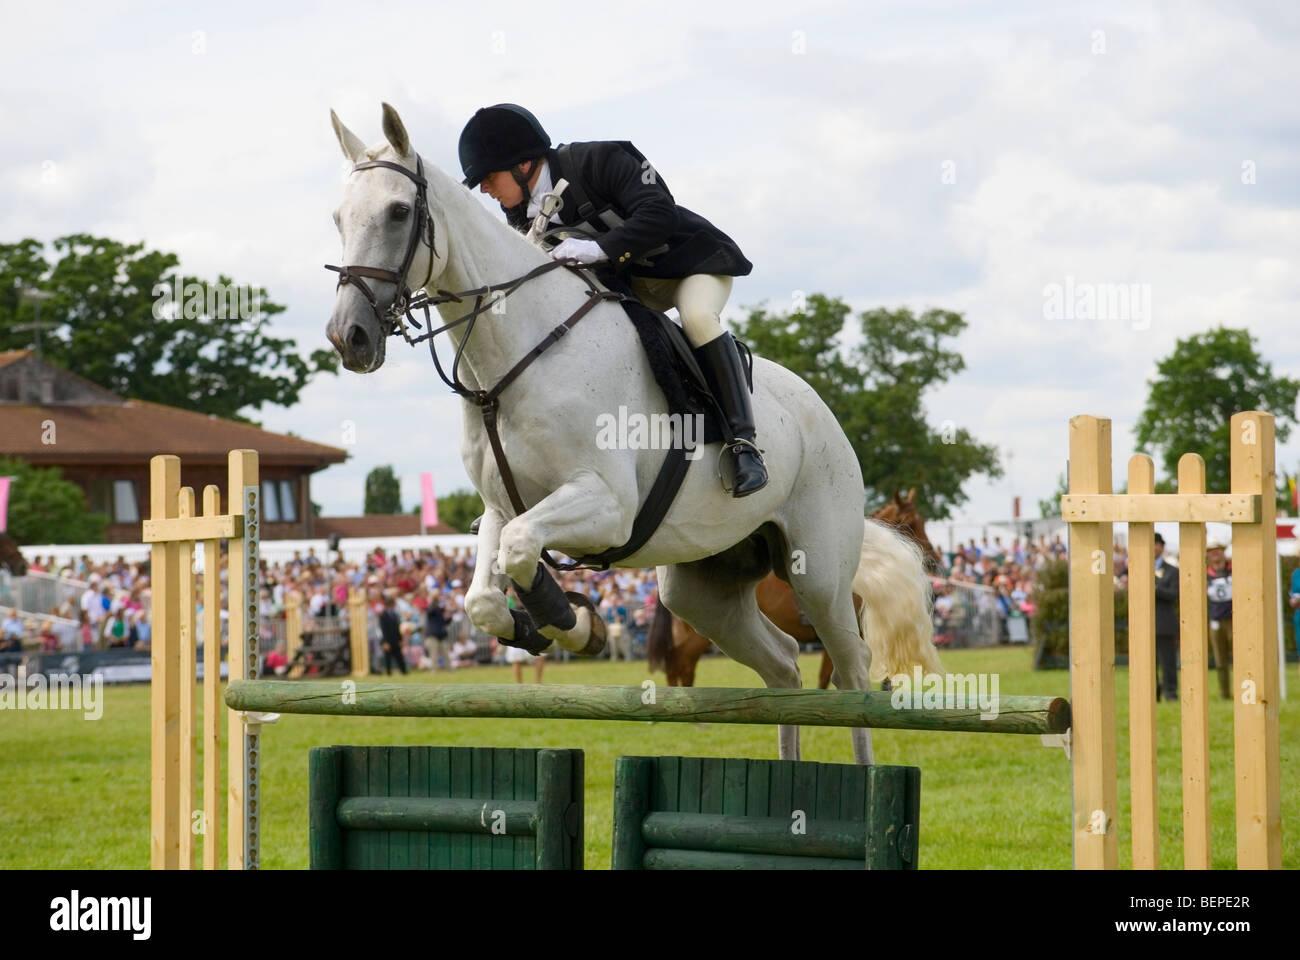 Show Jumping en el último evento Royal Show nunca Imagen De Stock